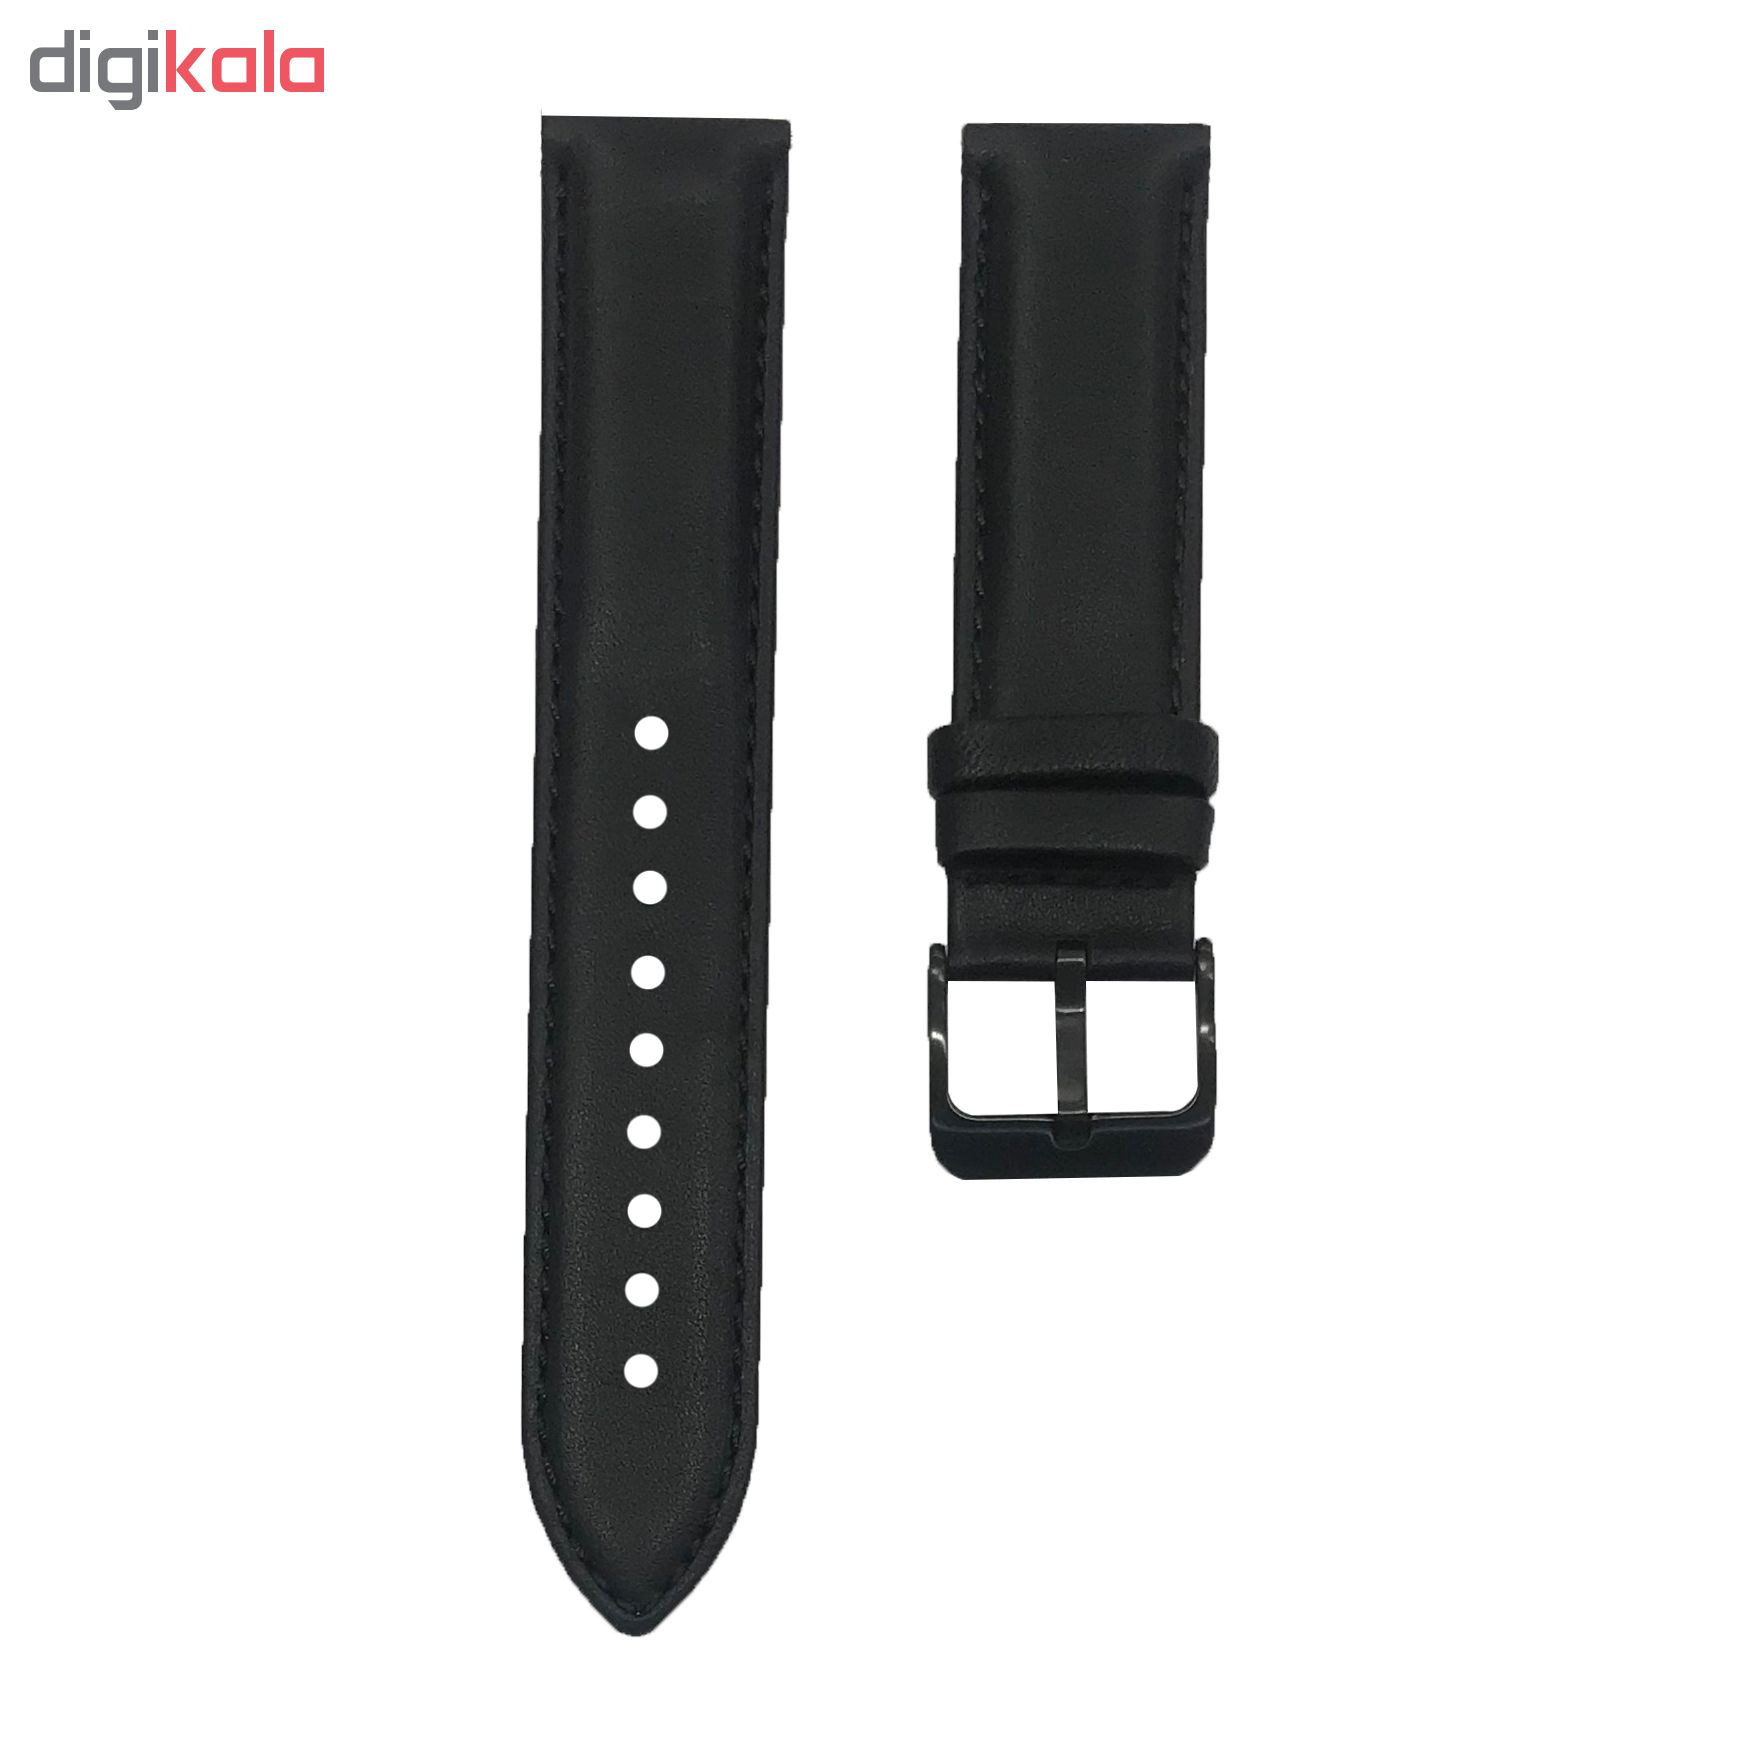 بند مدل CH-02 مناسب برای ساعت هوشمند سامسونگ Gear S2 Classic / Gear Sport / Galaxy Watch 42mm